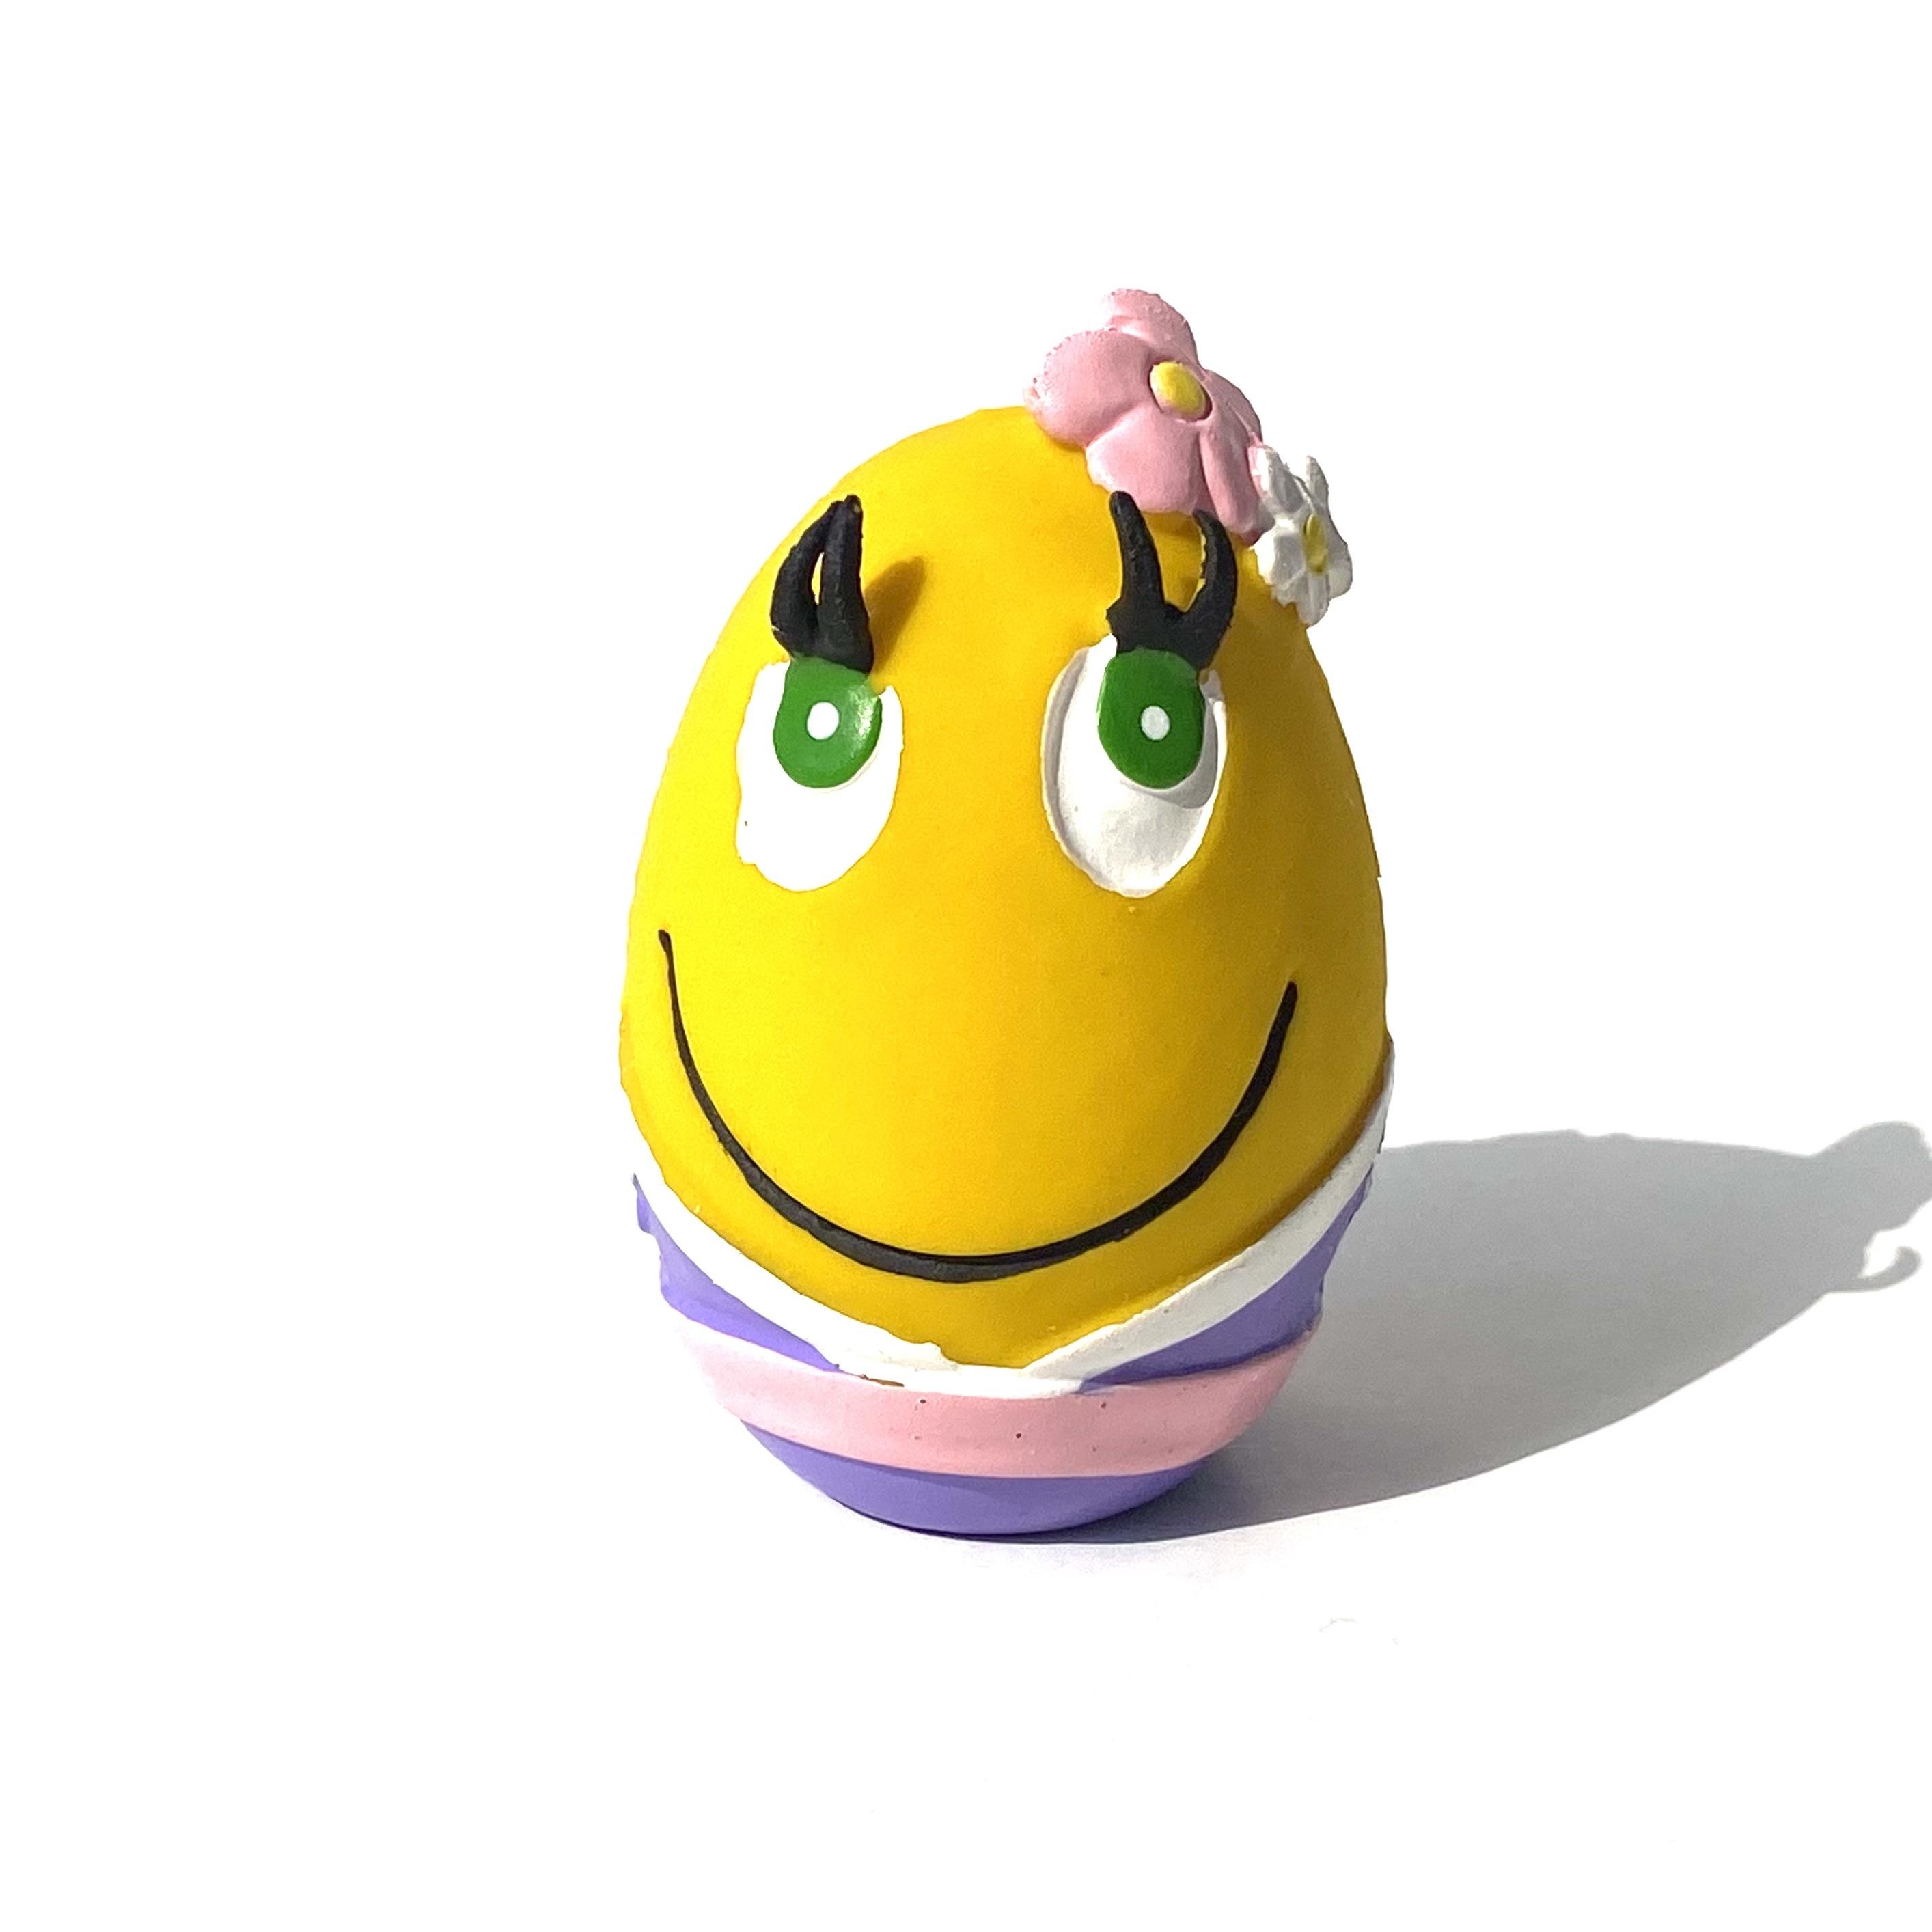 LANCO Kimono Egg ランコ 着物タマゴ_d0217958_15552115.jpeg